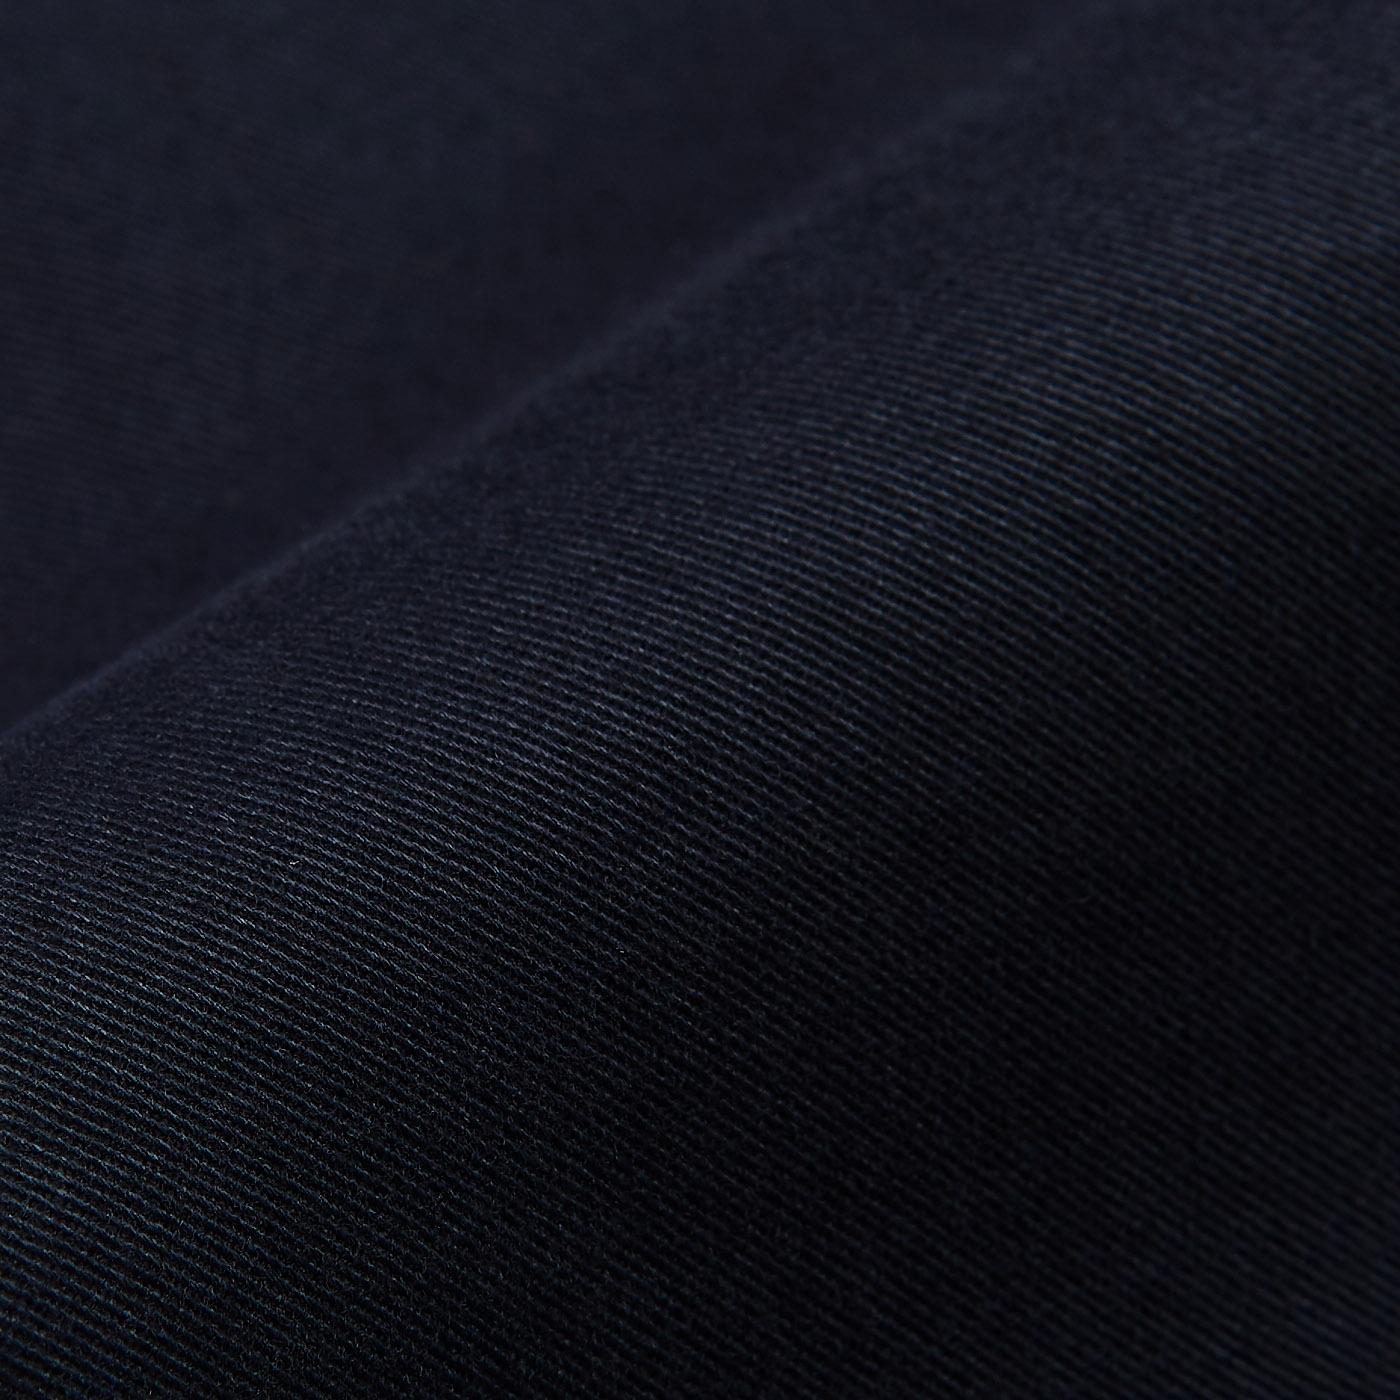 Hiltl Navy Cotton Stretch Regular Chinos Fabric